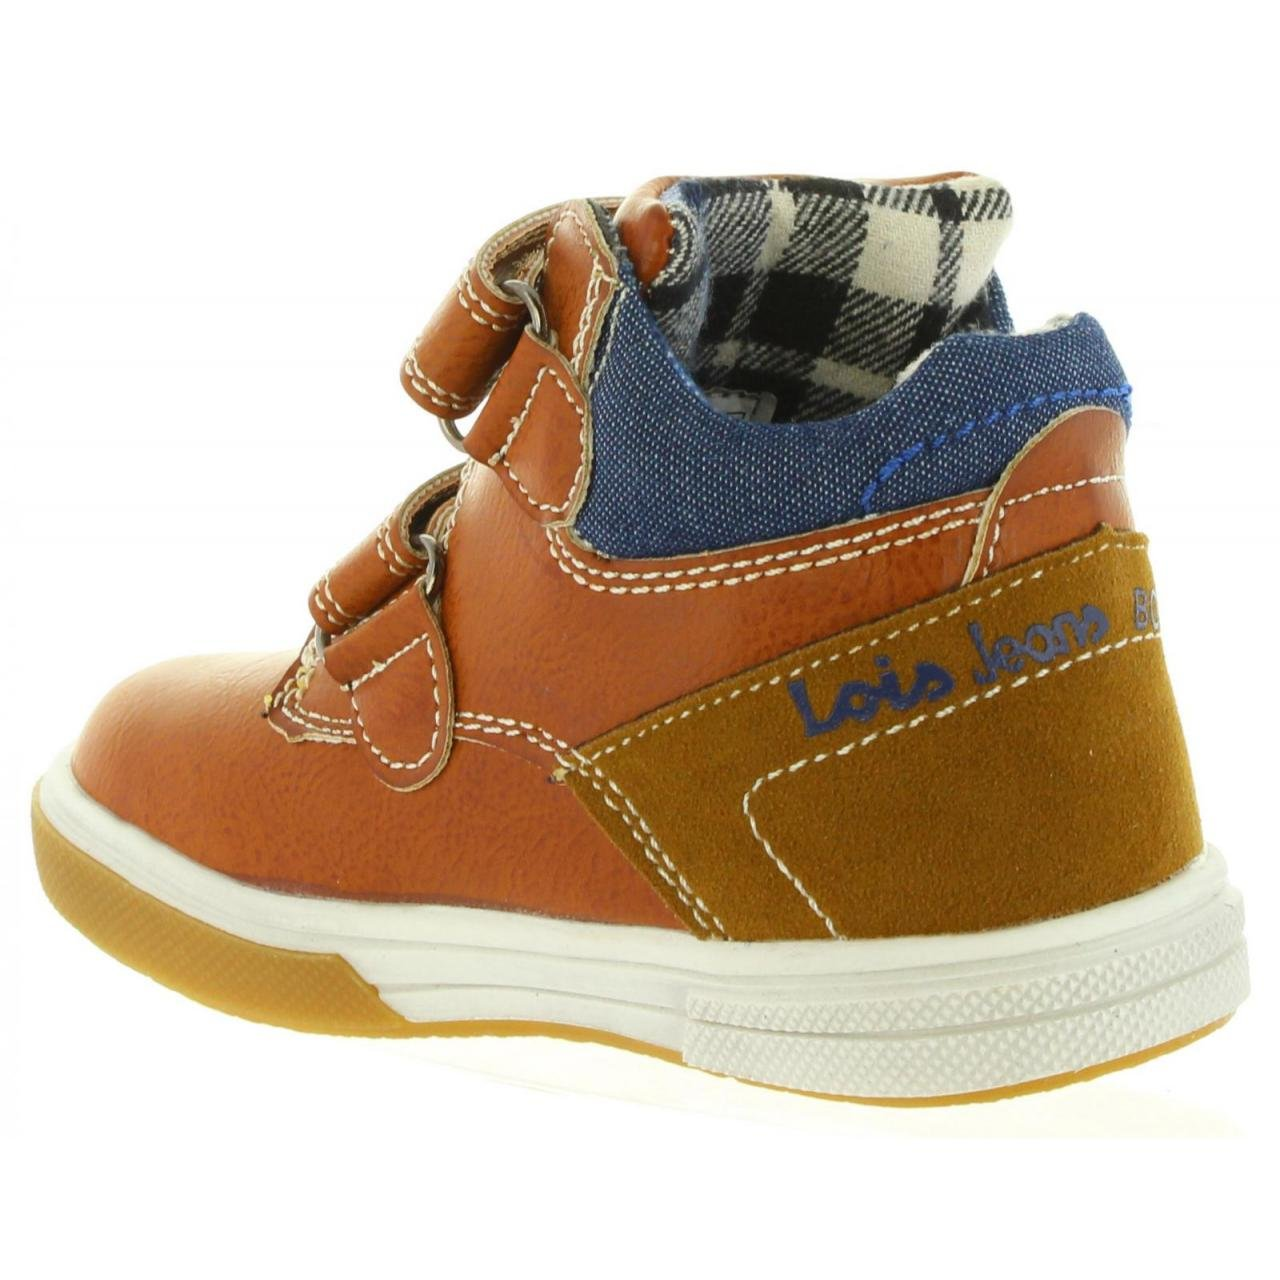 Zapatos Niña 46011 es Botines Camel Amazon Talla Y 43 Complementos De Lois  23 Niño Jeans twfqOxCf fea27b6707e